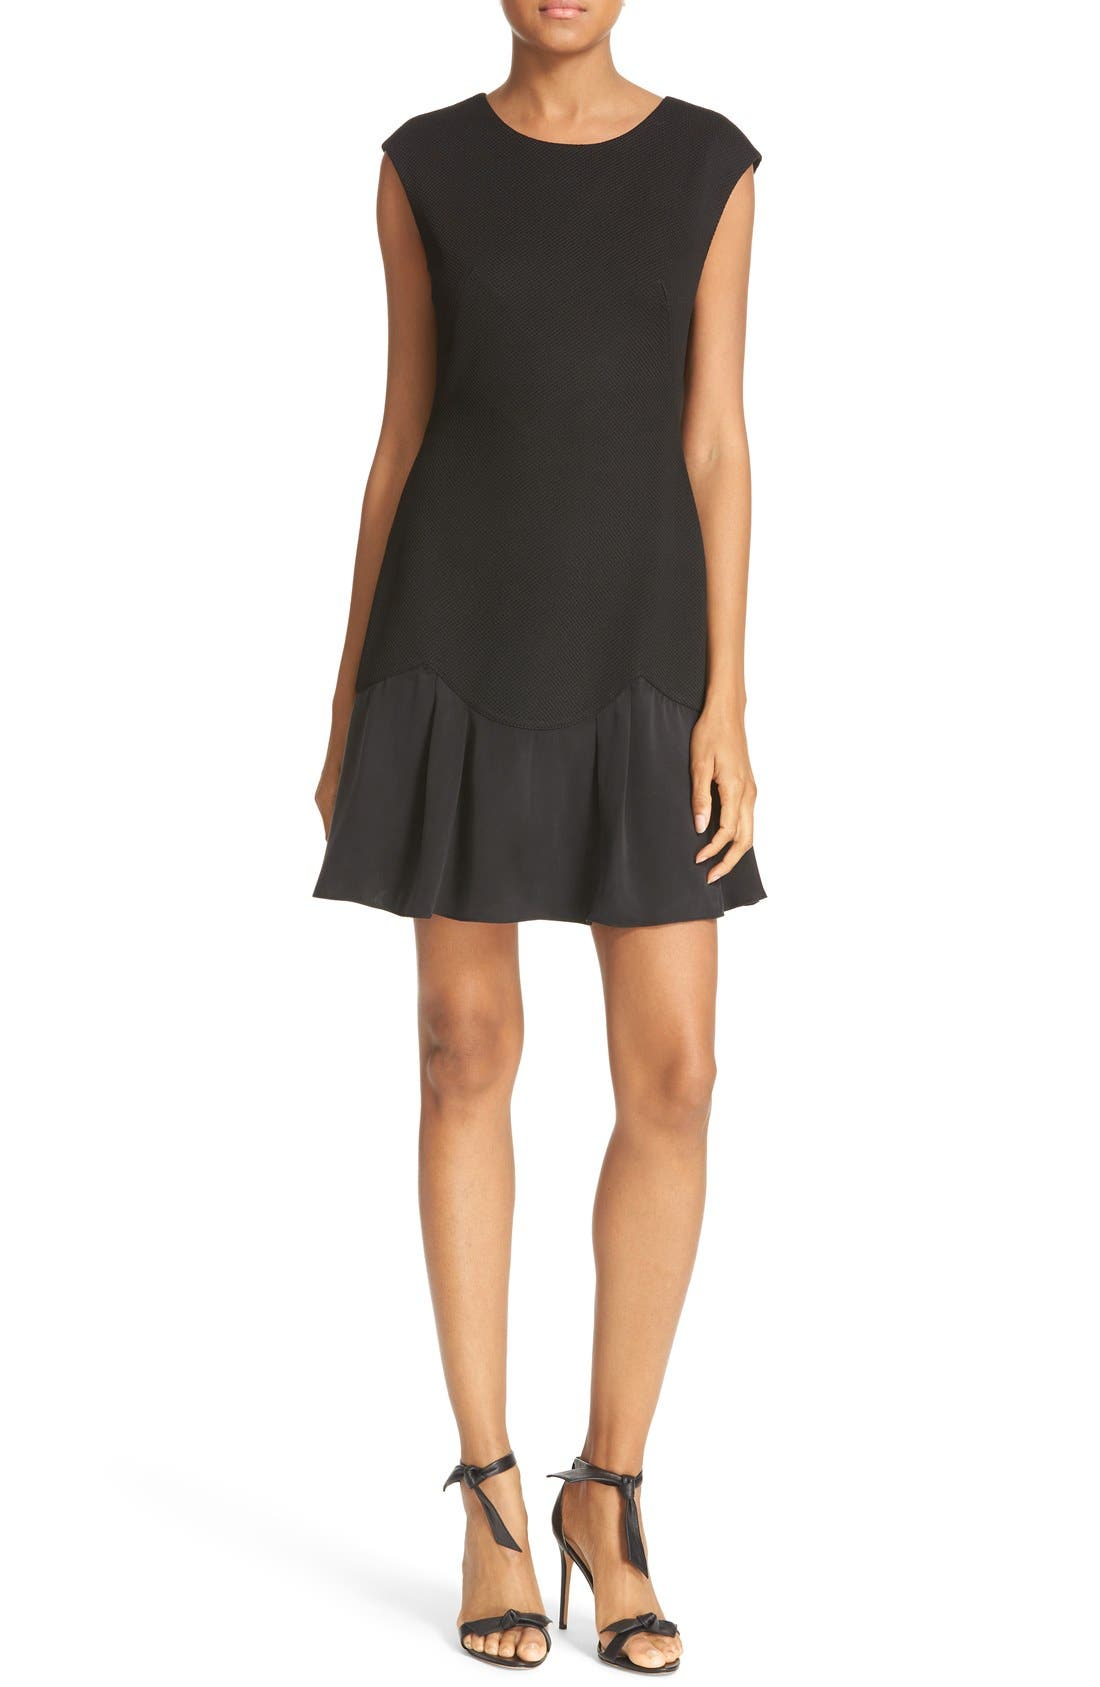 REBECCA TAYLOR, Stacy Drop Waist Dress, Main thumbnail 1, color, BLACK